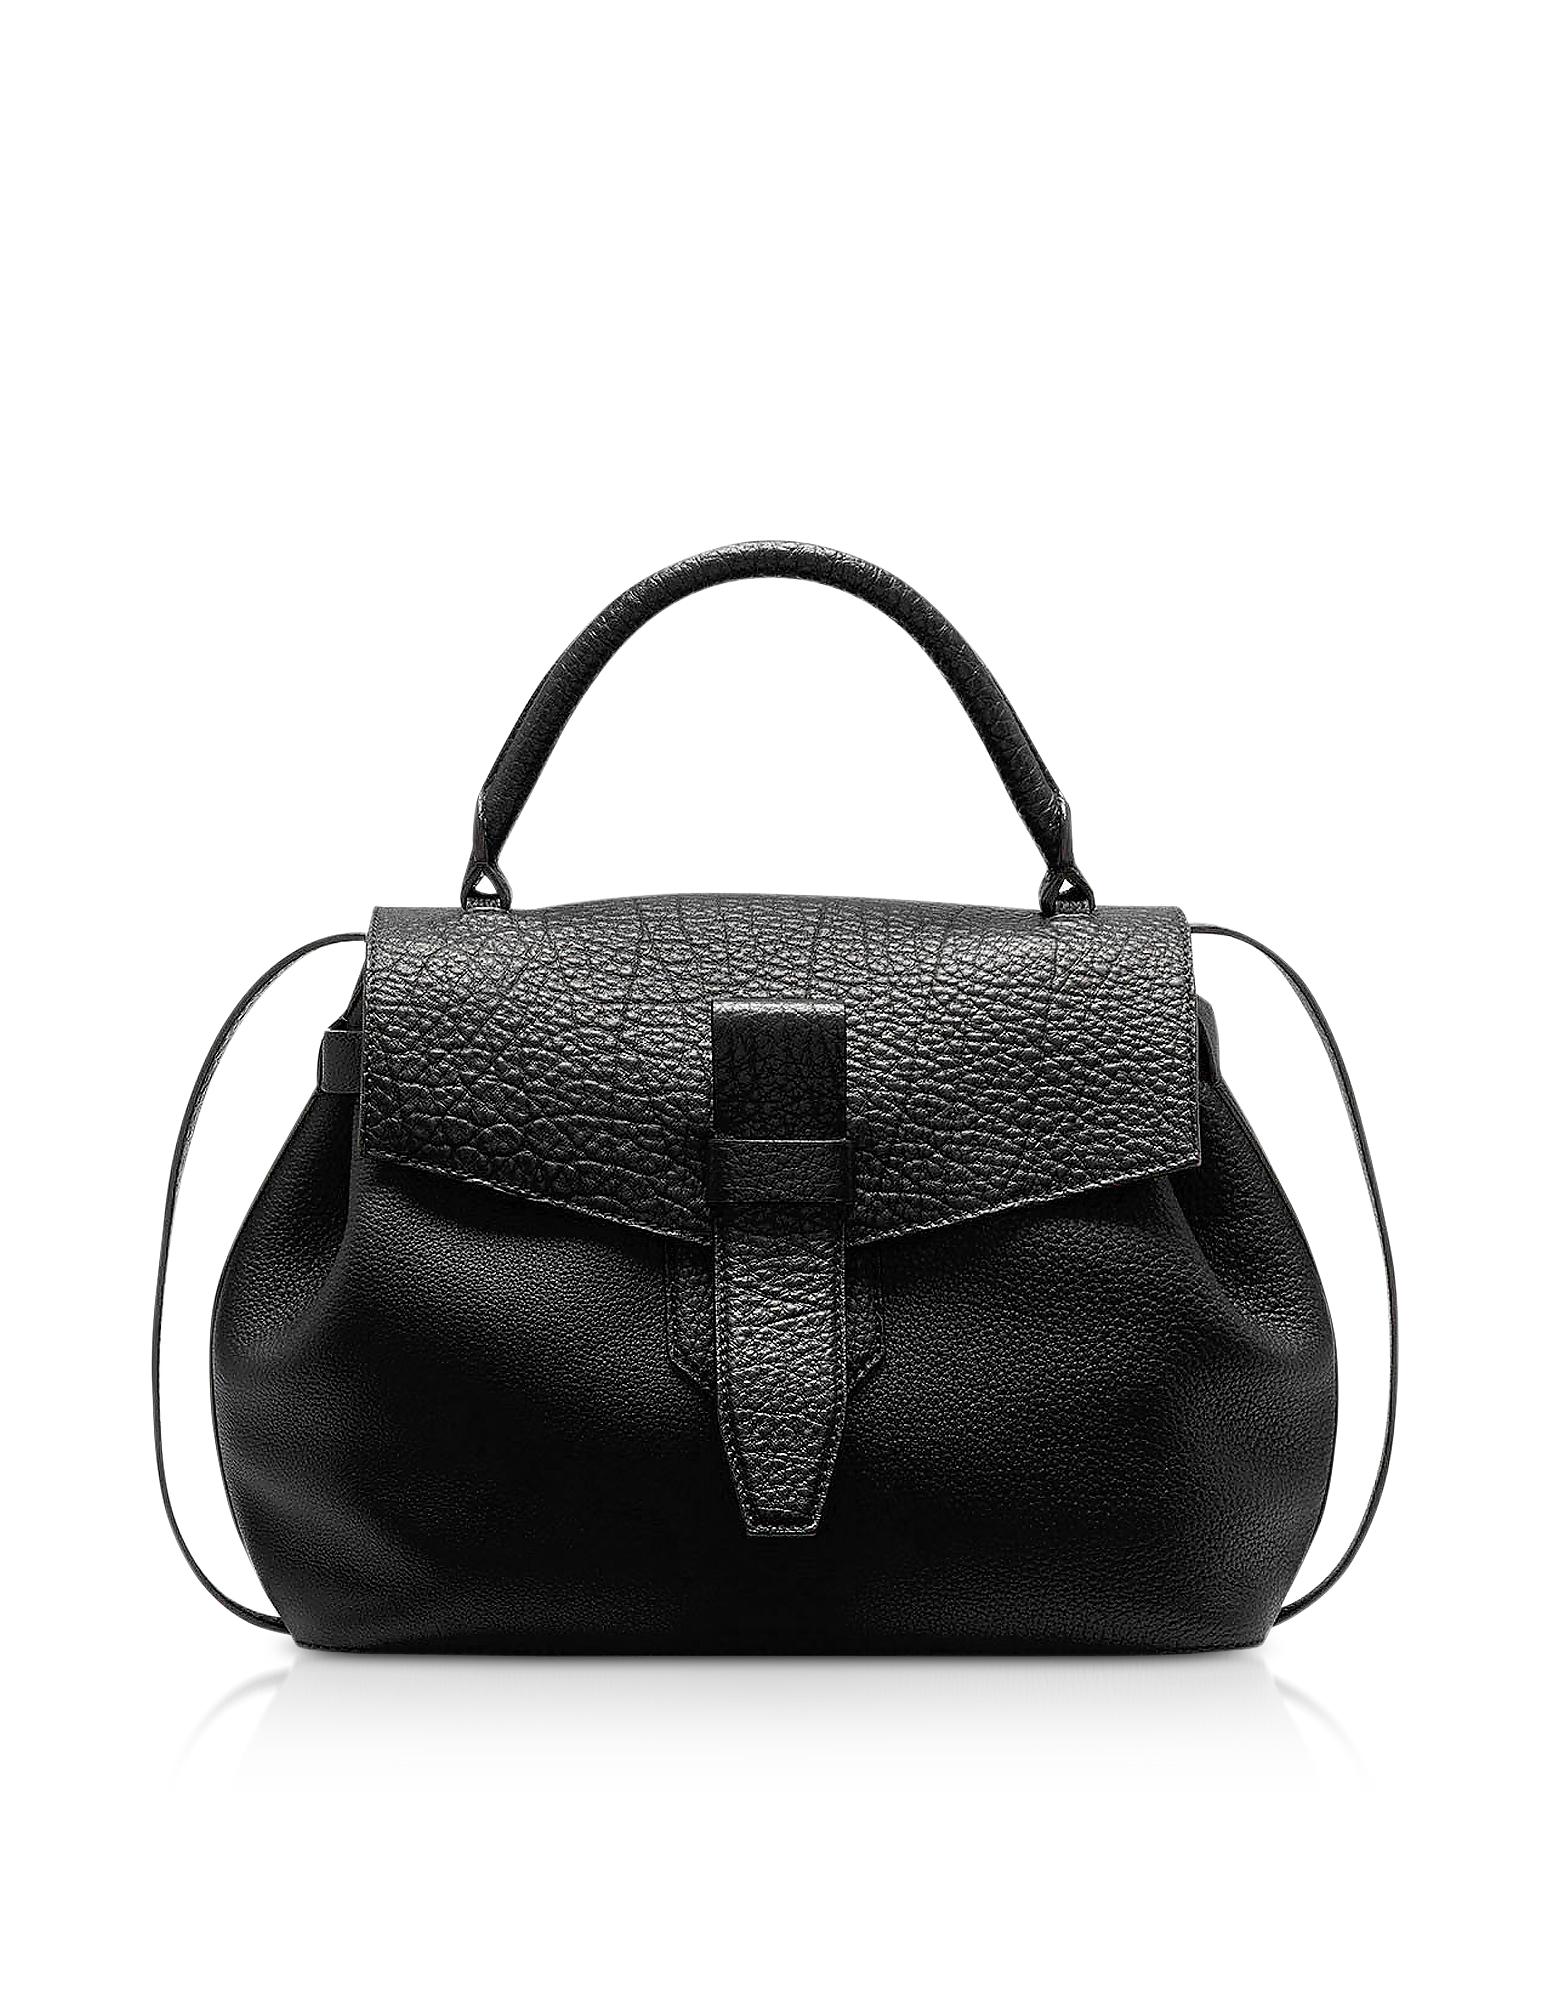 Lancel Designer Handbags, Charlie Medium Grained Leather Handbag